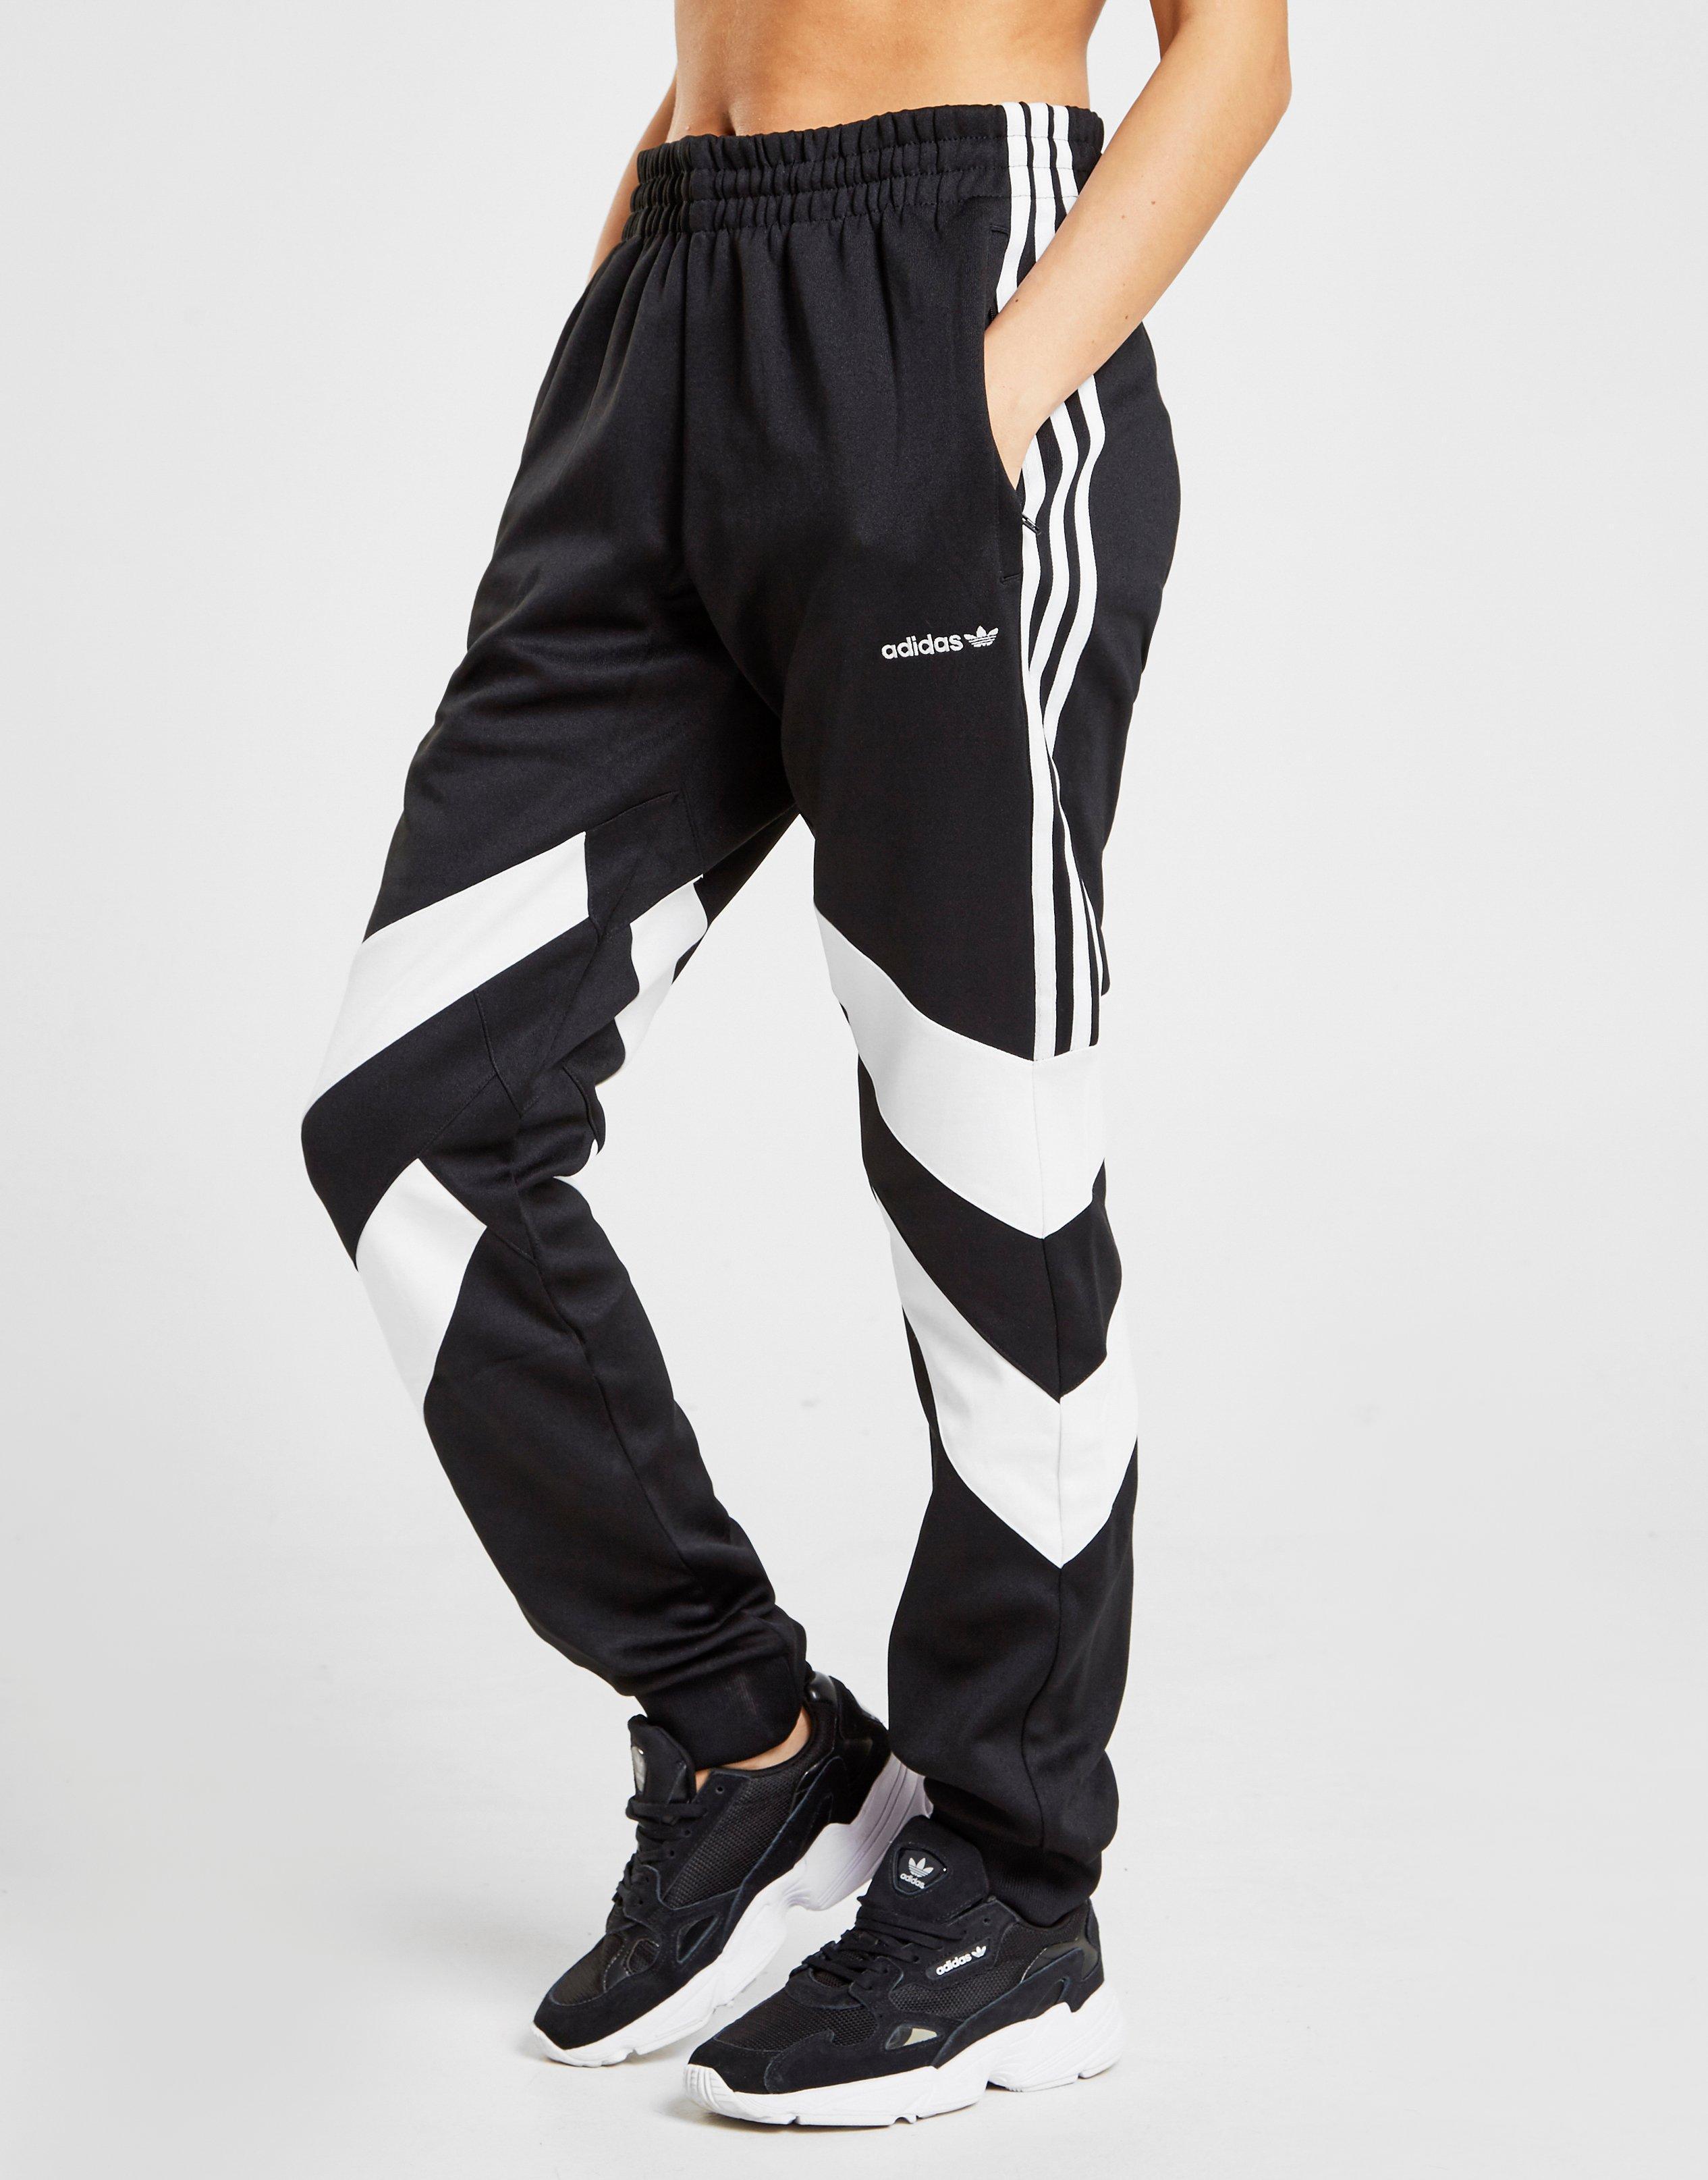 adidas Originals Cotton Palmeston Track Pants in BlackWhite